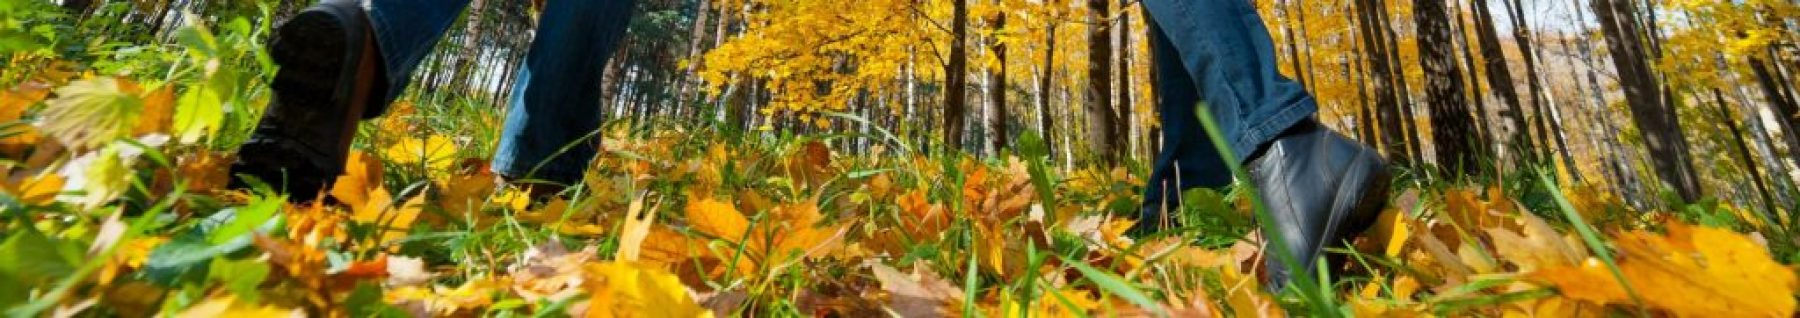 herfst-min